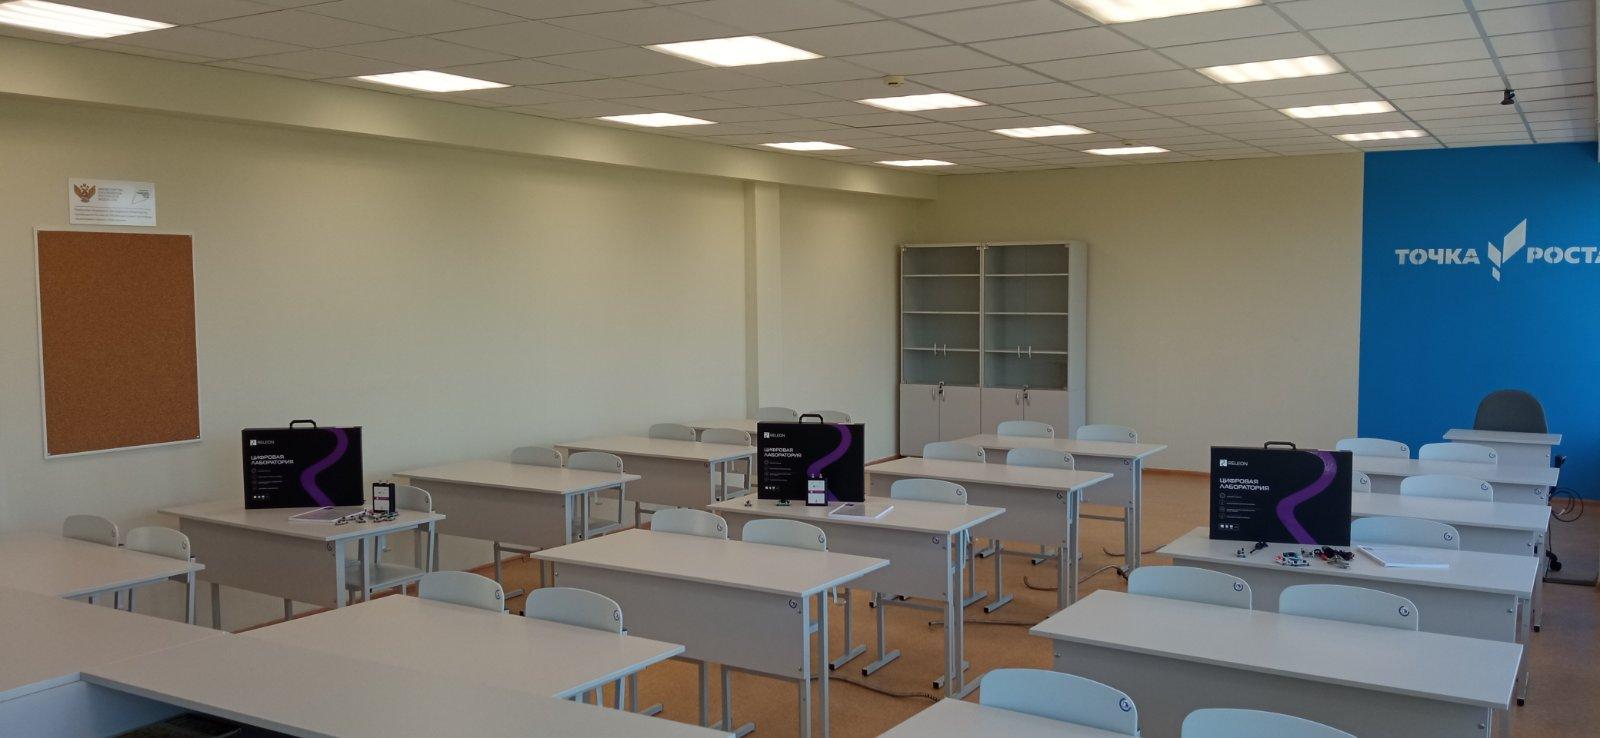 кабинет физики 1